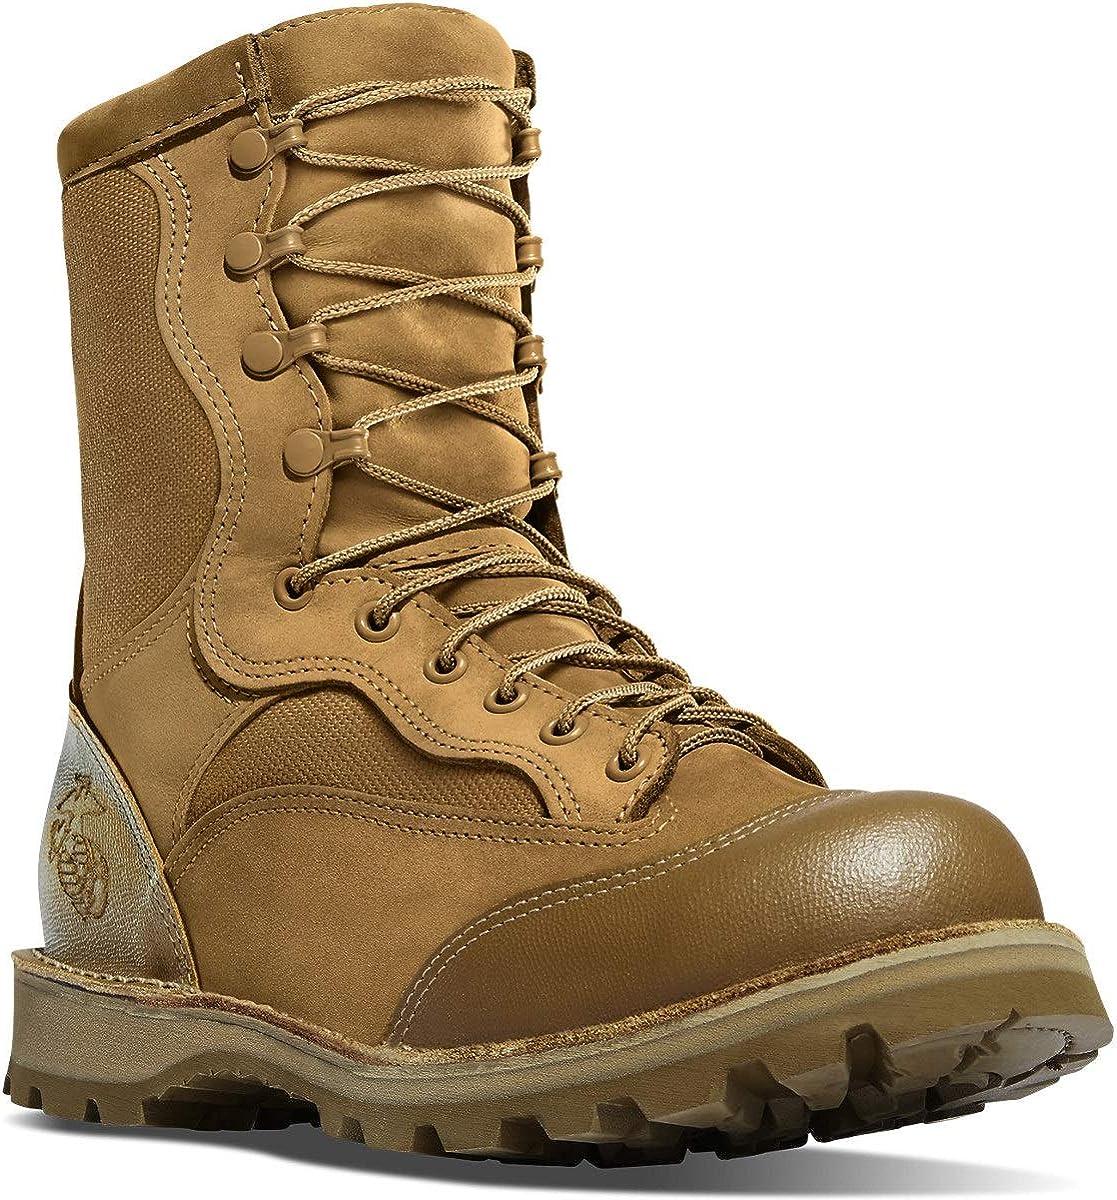 Danner USMC Rat security 8IN Outlet sale feature - Men's Boot GTX